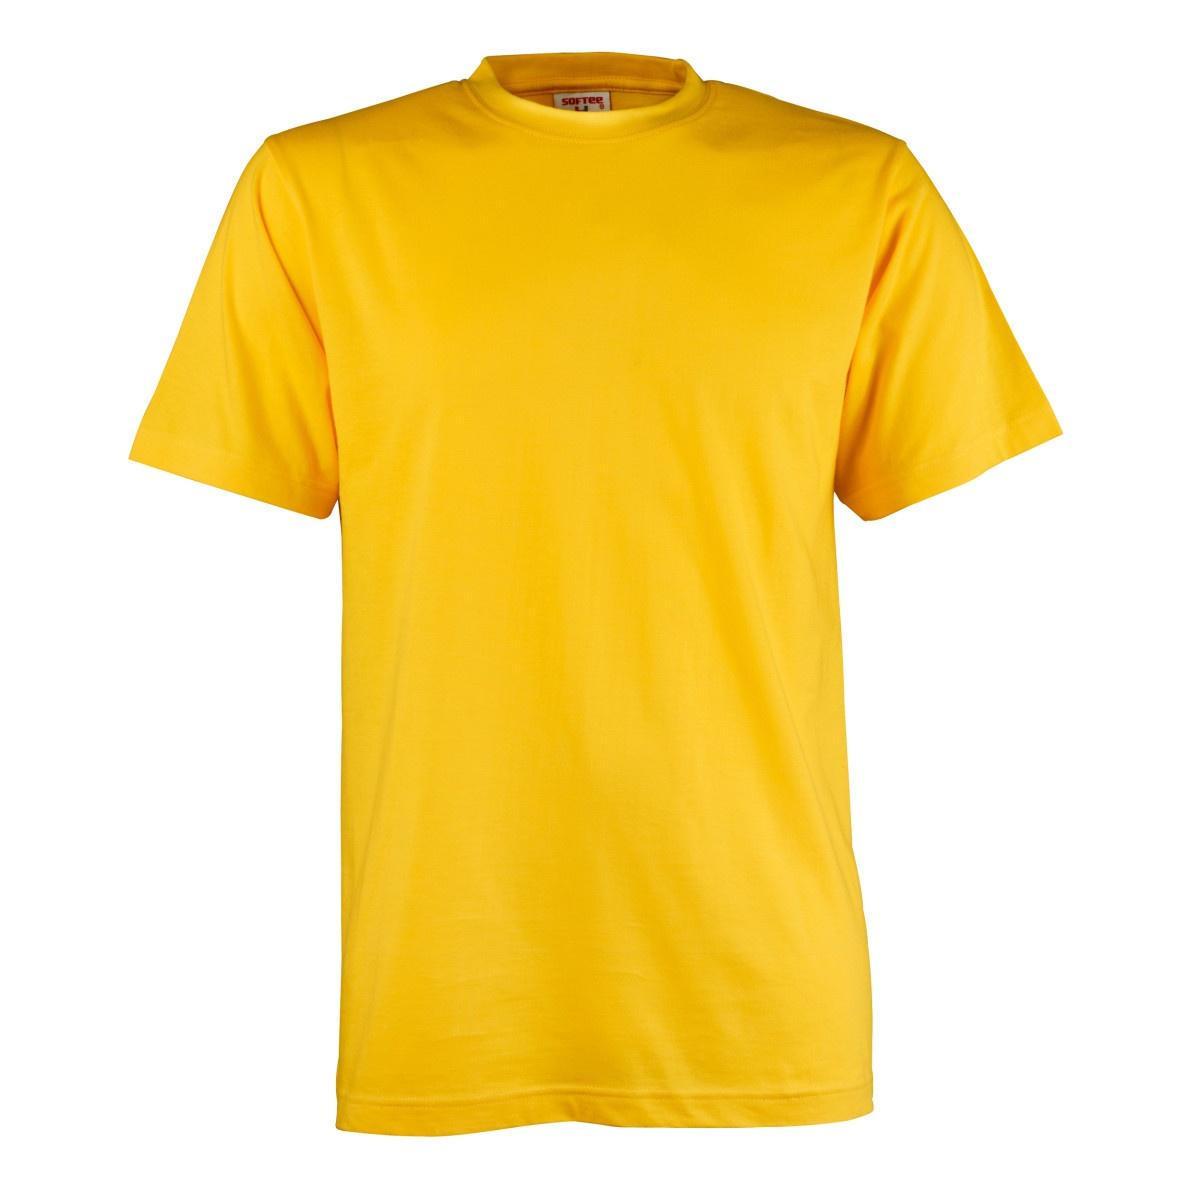 Tee Jays Mens Short Sleeve T-Shirt (3XL) (Black)